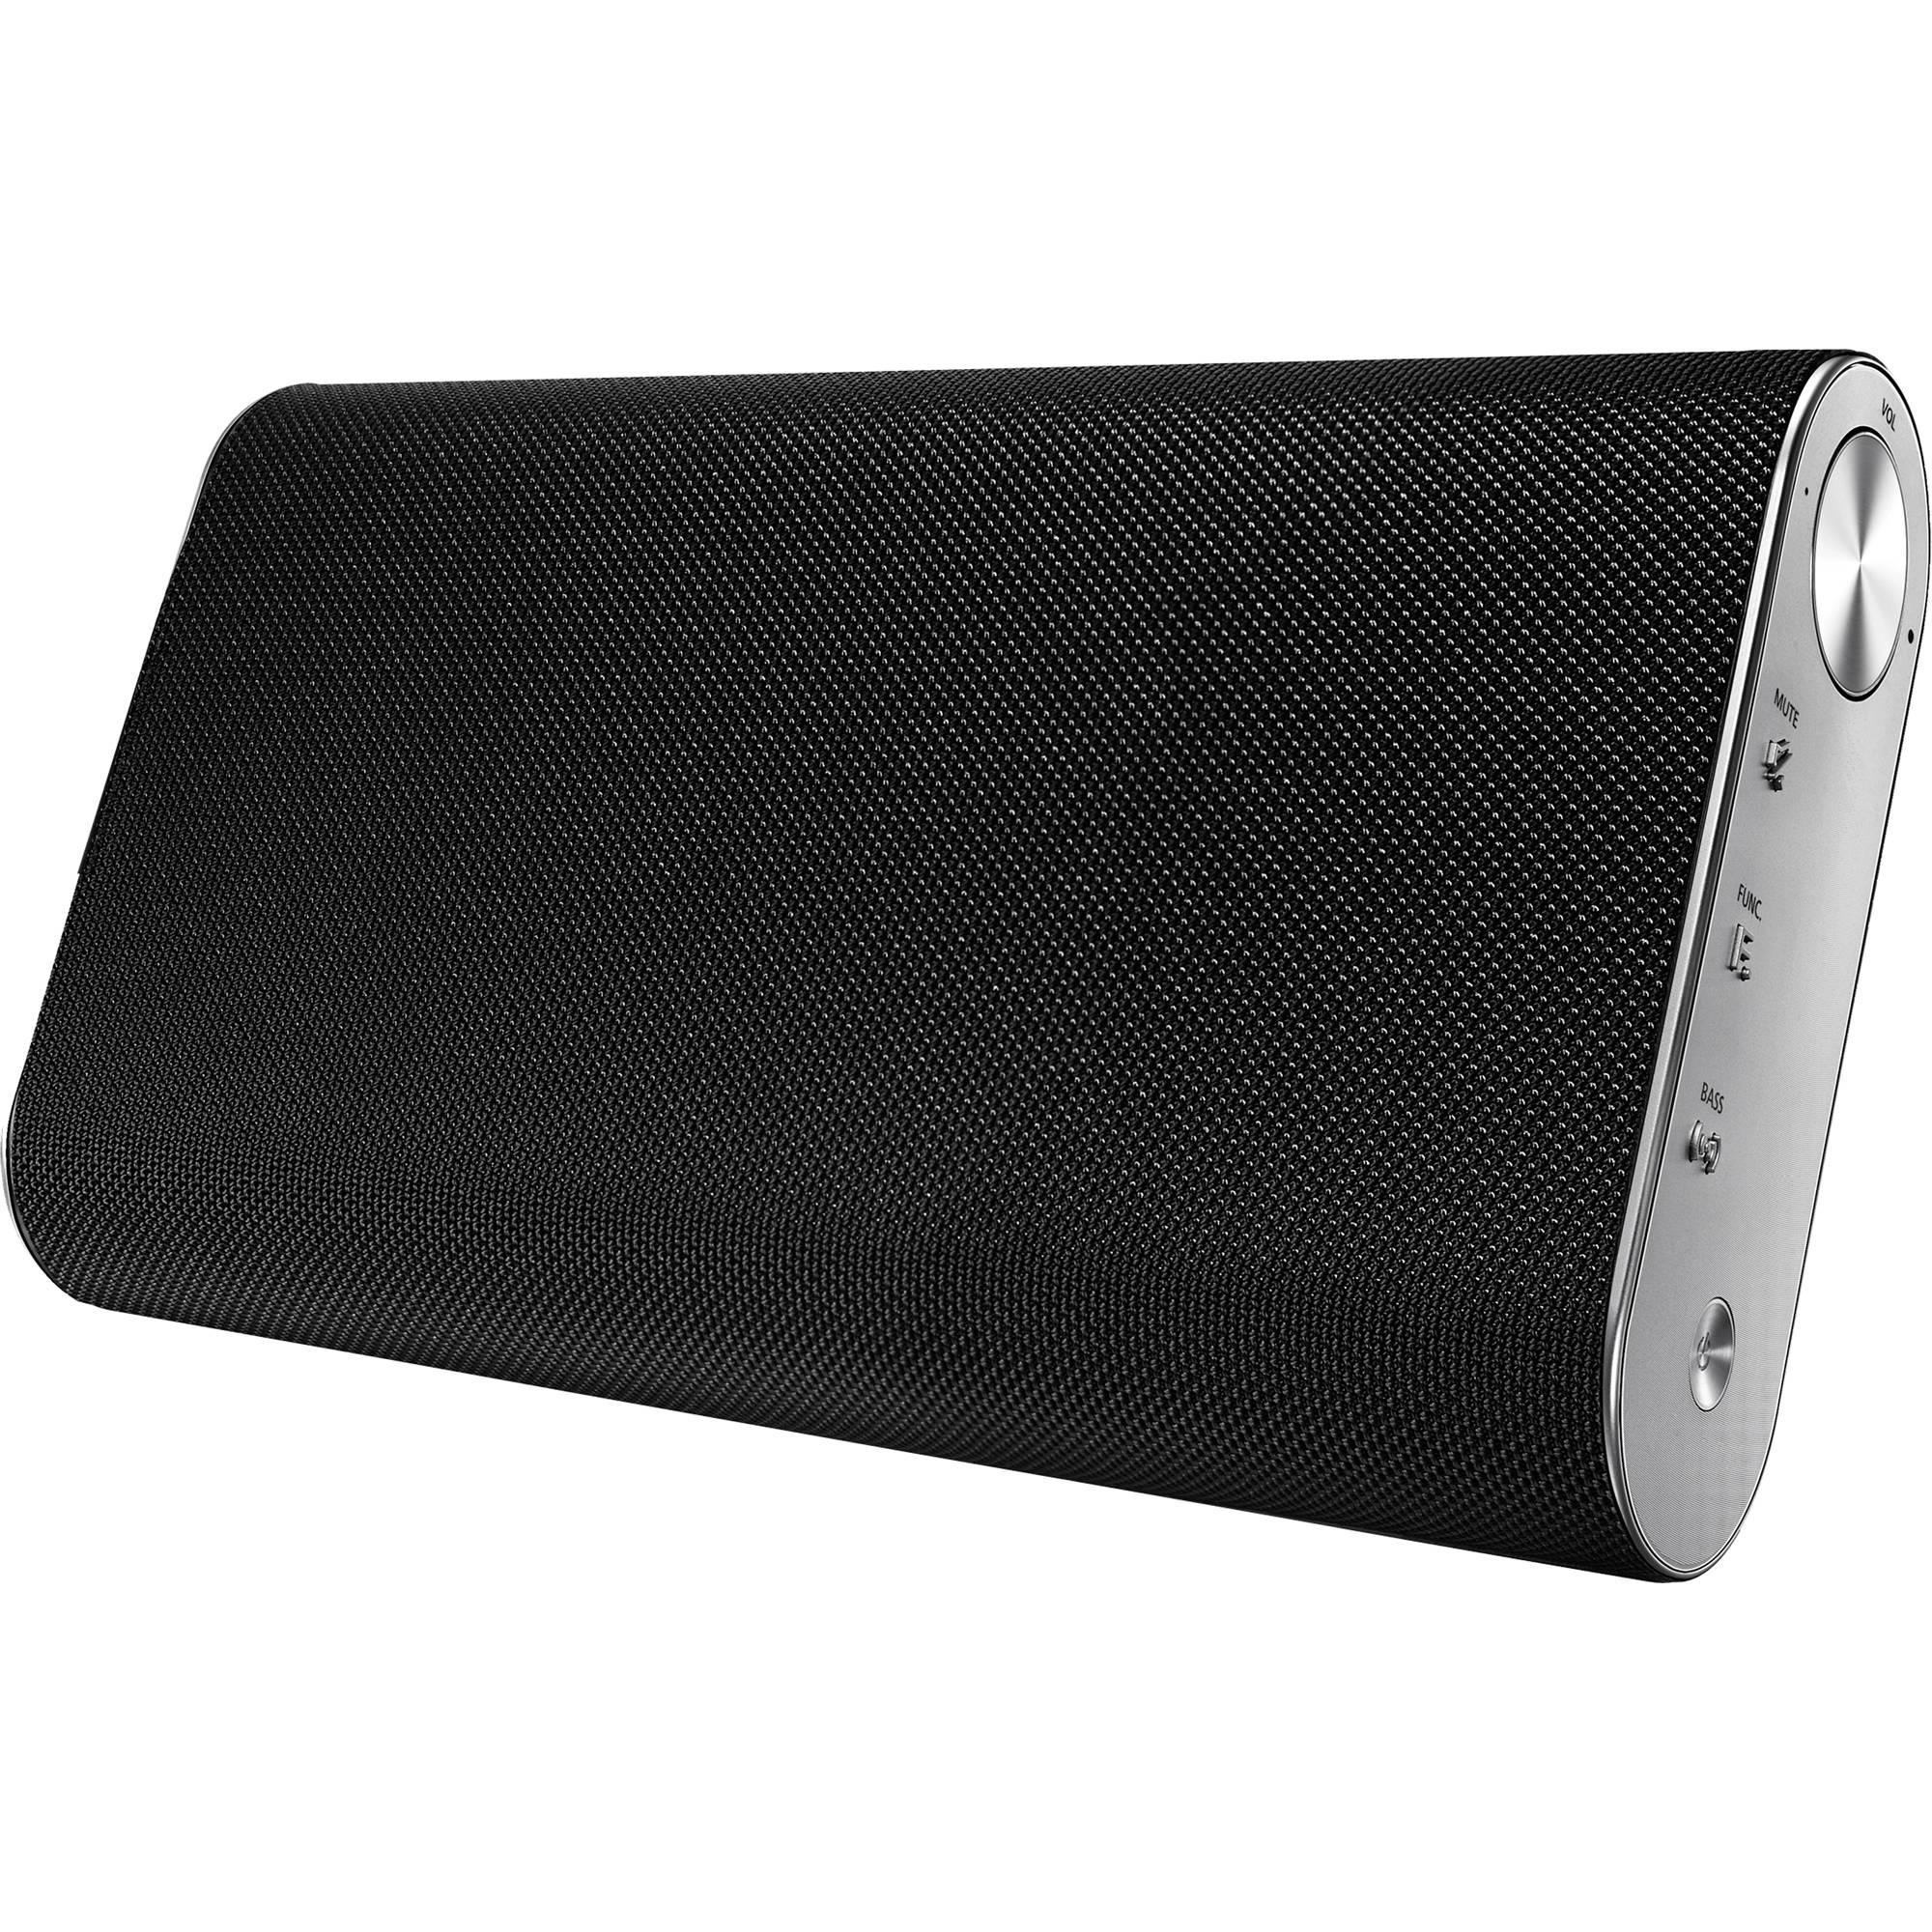 Samsung Portable Wireless Speaker With NFC (Black) DA-F60